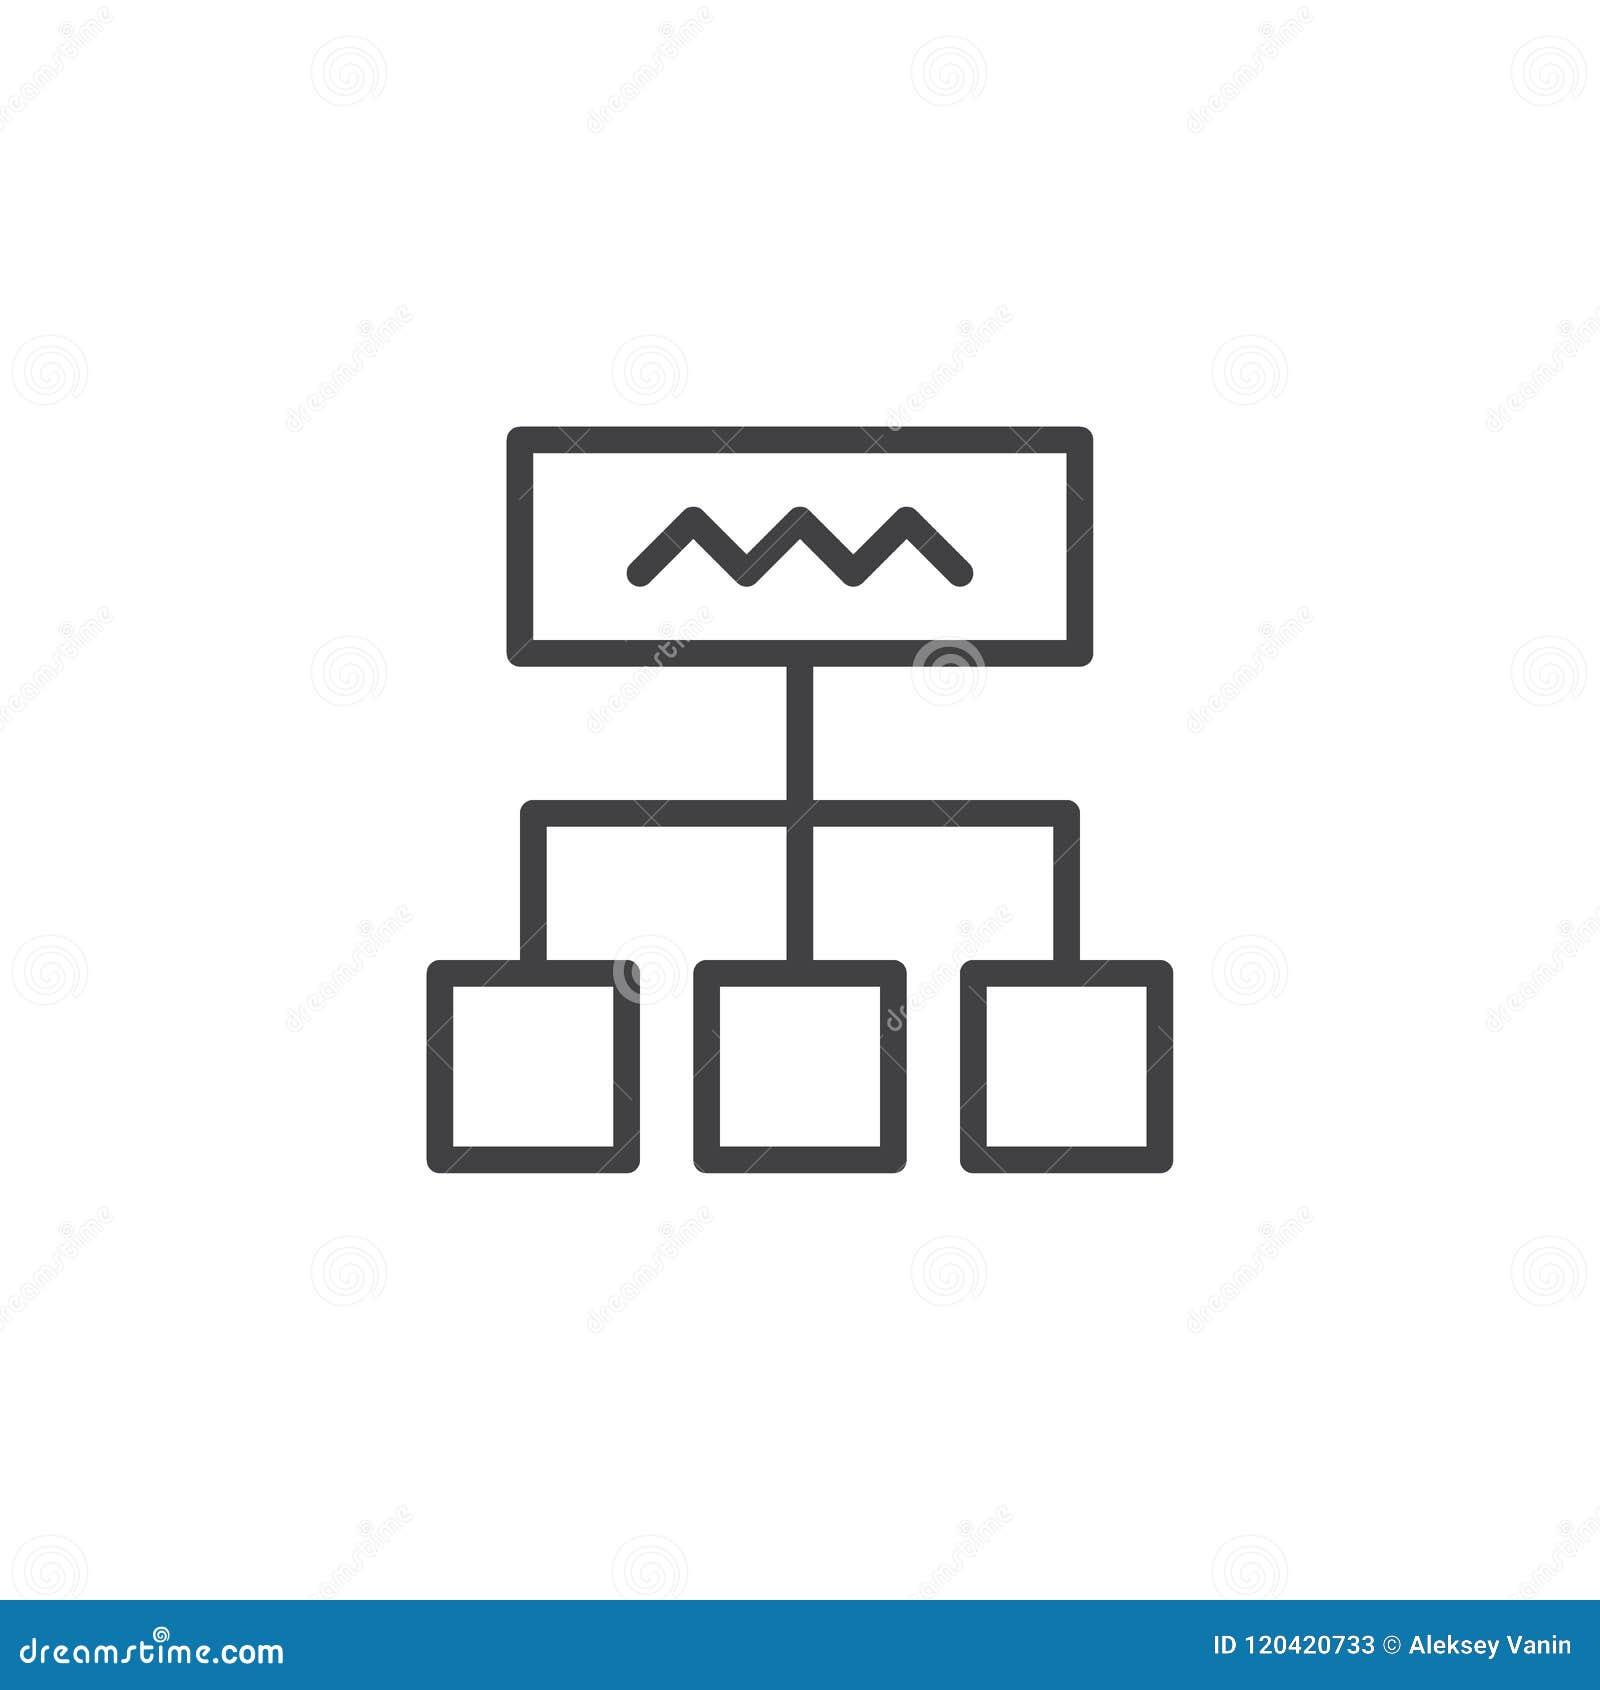 Diagram outline icon